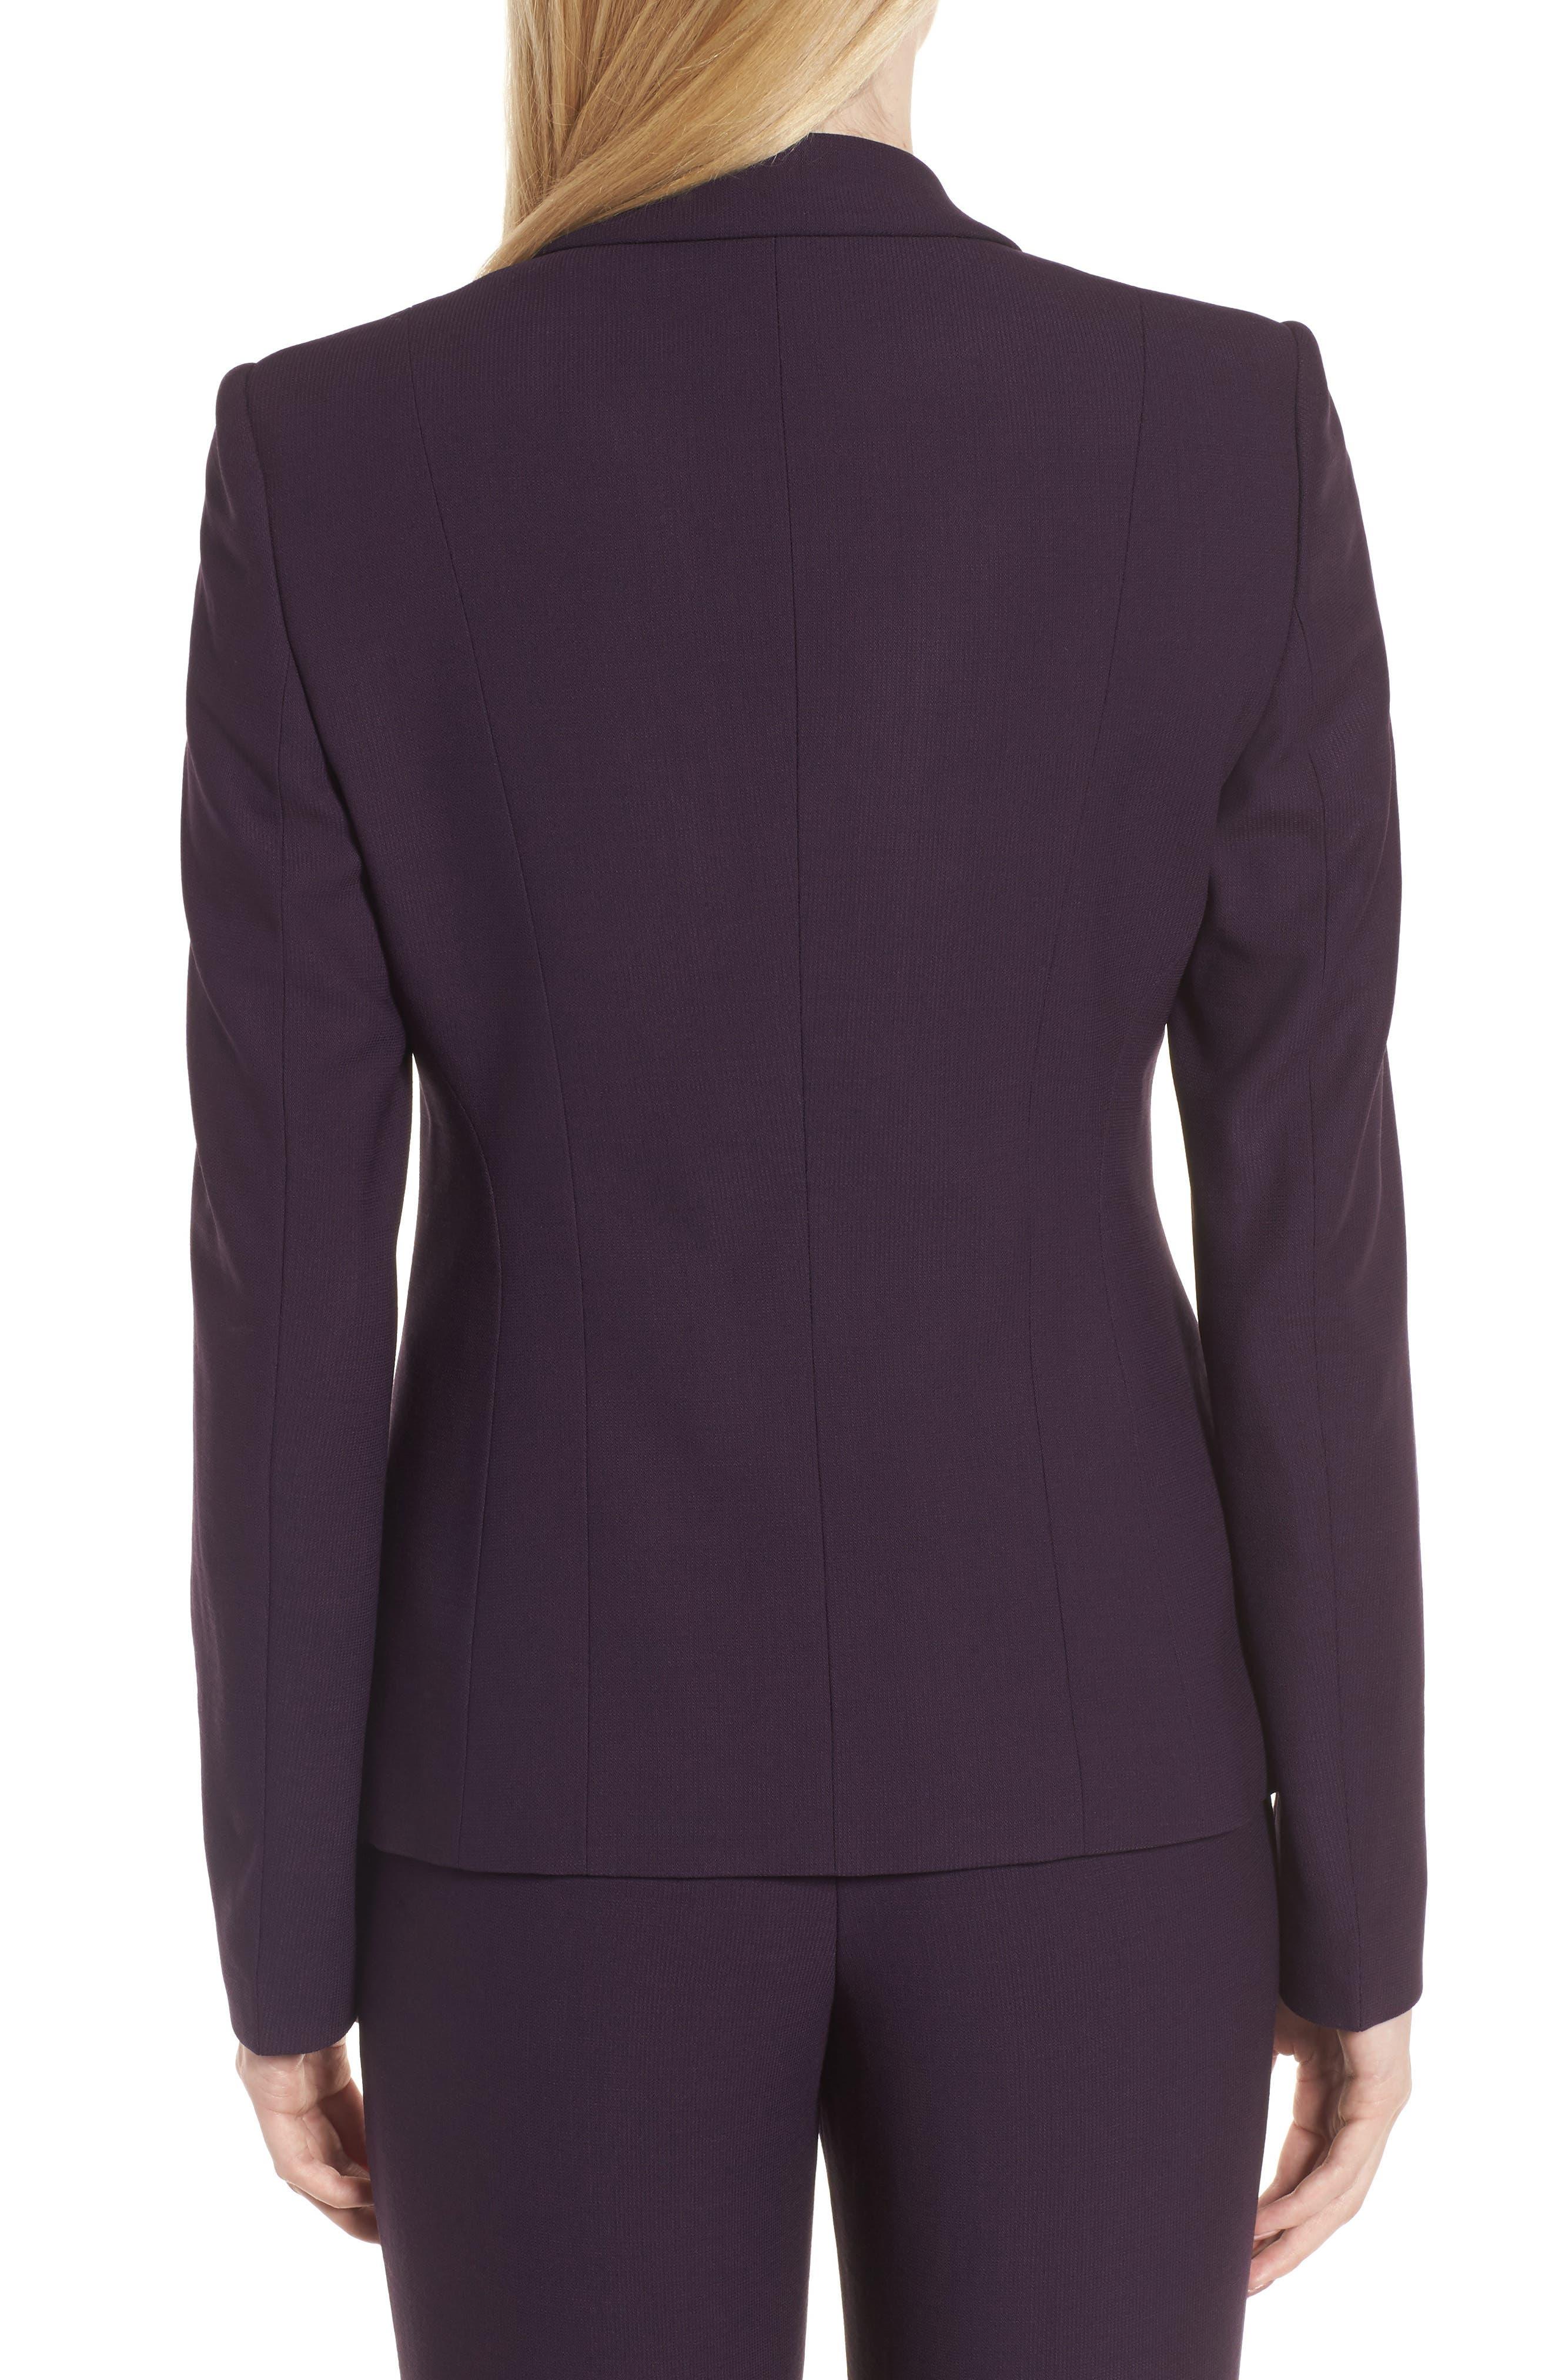 Alternate Image 2  - BOSS Jonalua Stretch Wool Suit Jacket (Regular & Petite)